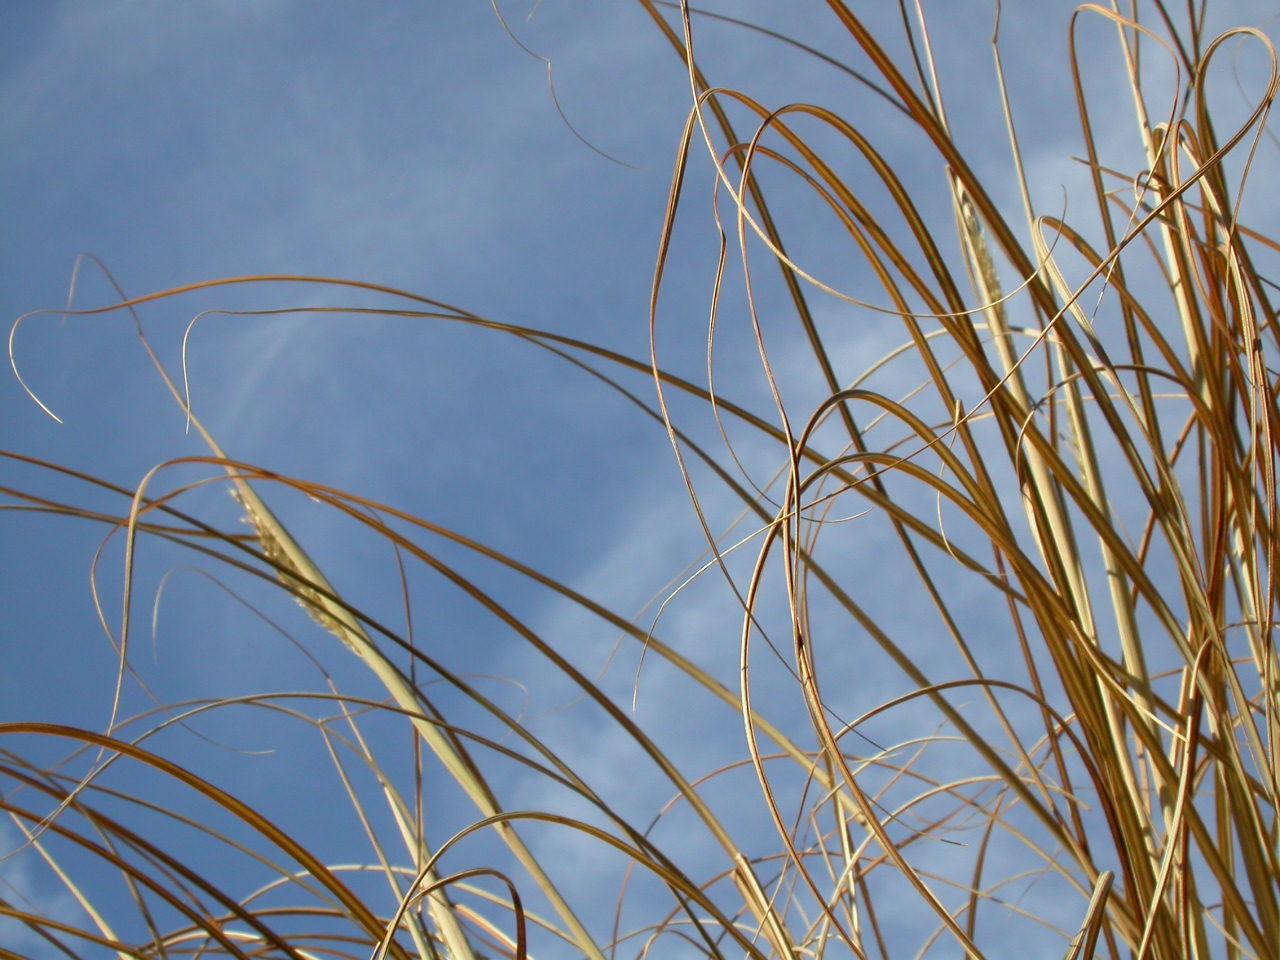 Straws against the sky photo